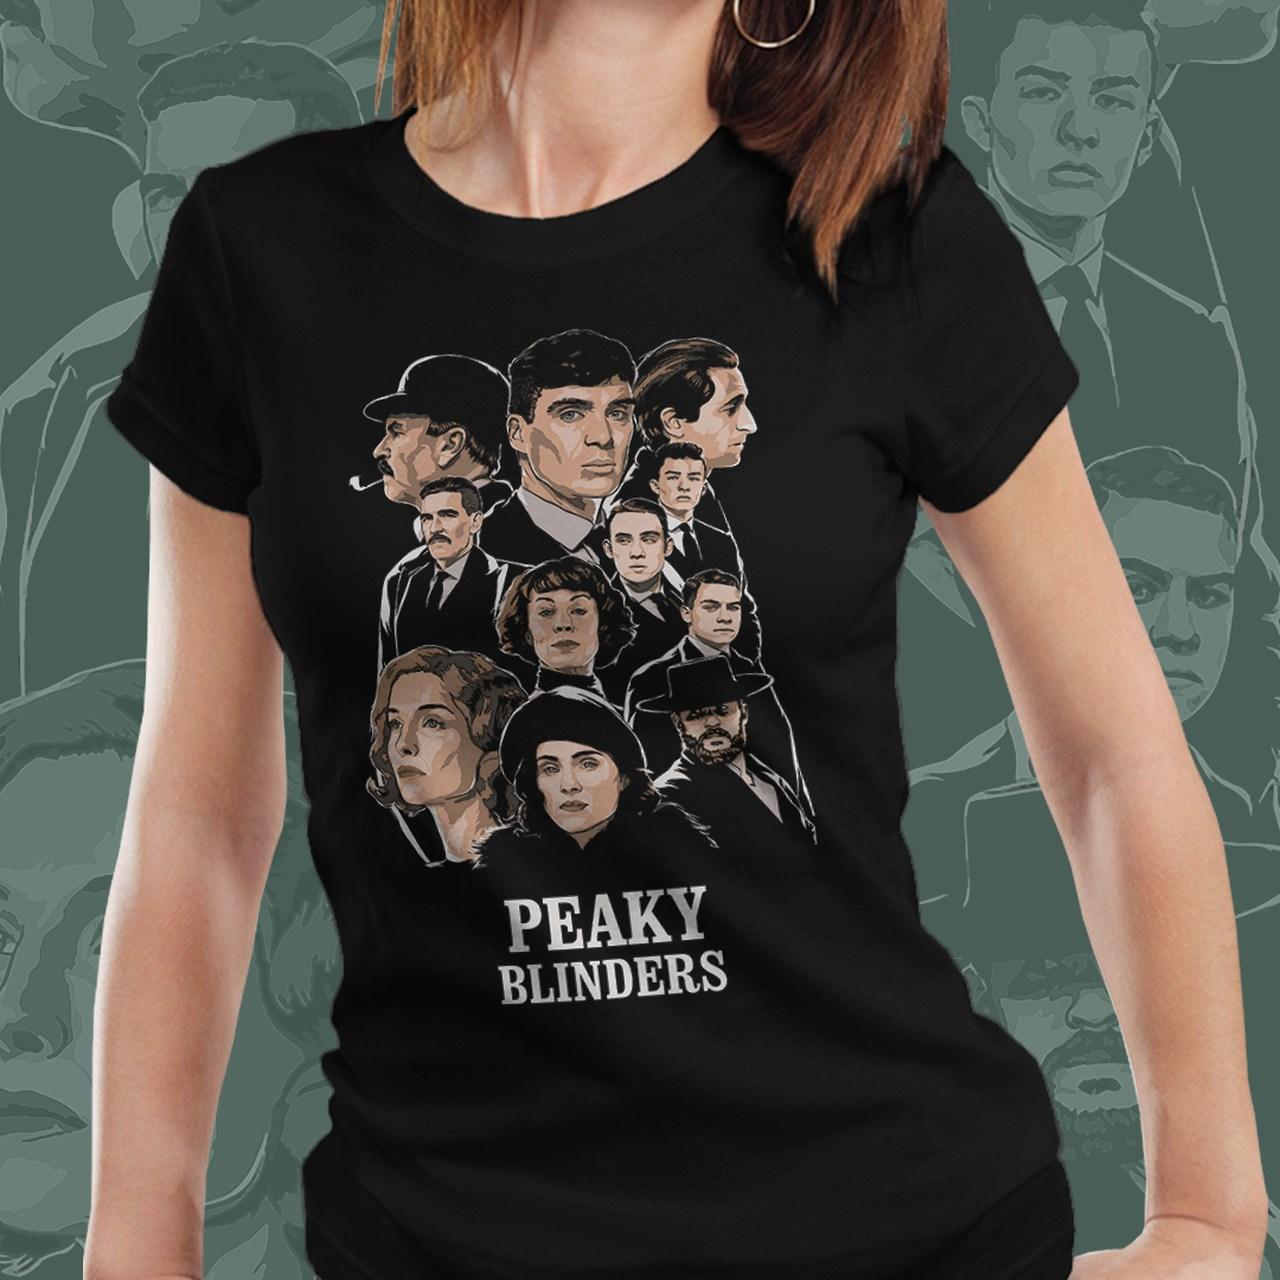 Camiseta Feminina: Peaky Blinders ( Personagens )